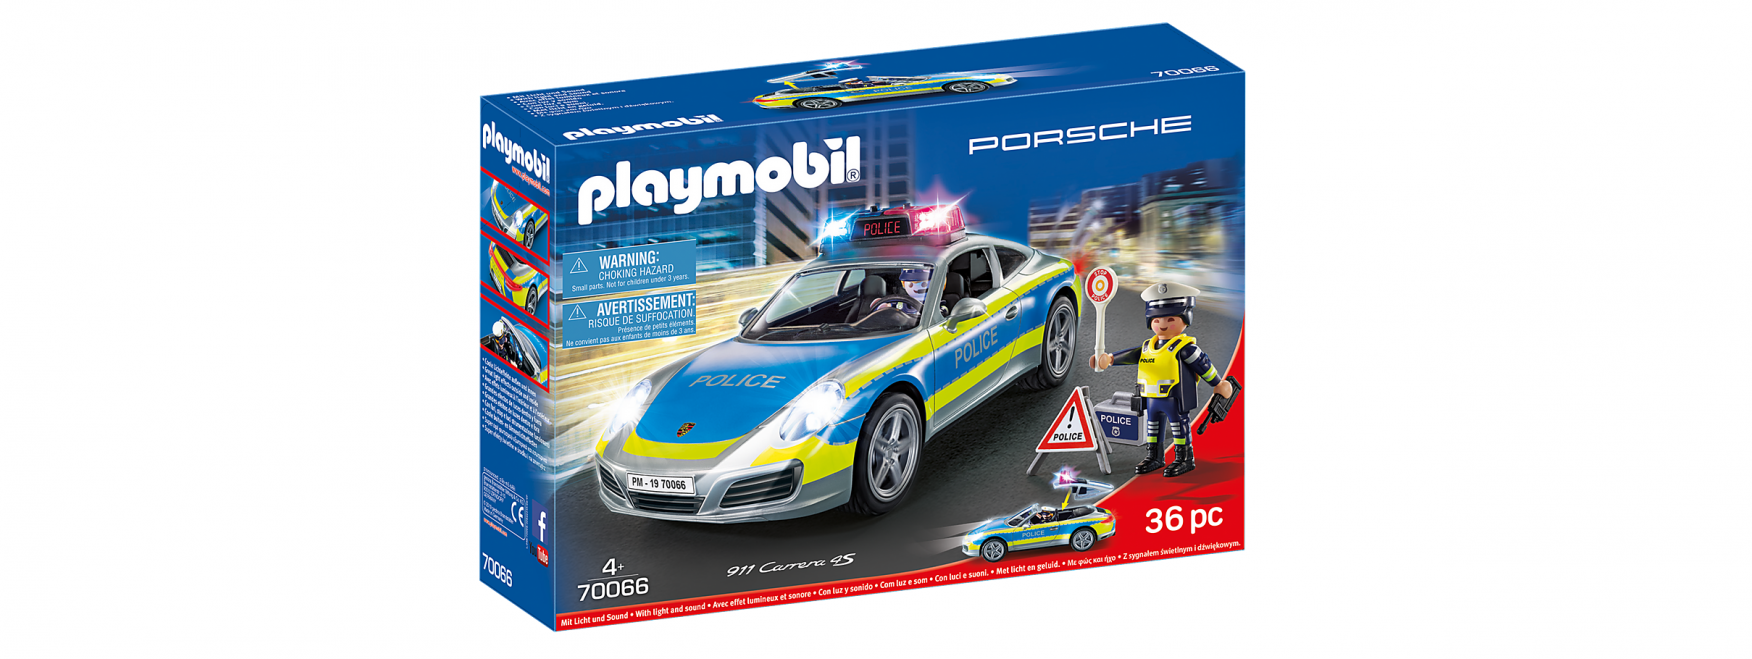 Playmobil y Porsche